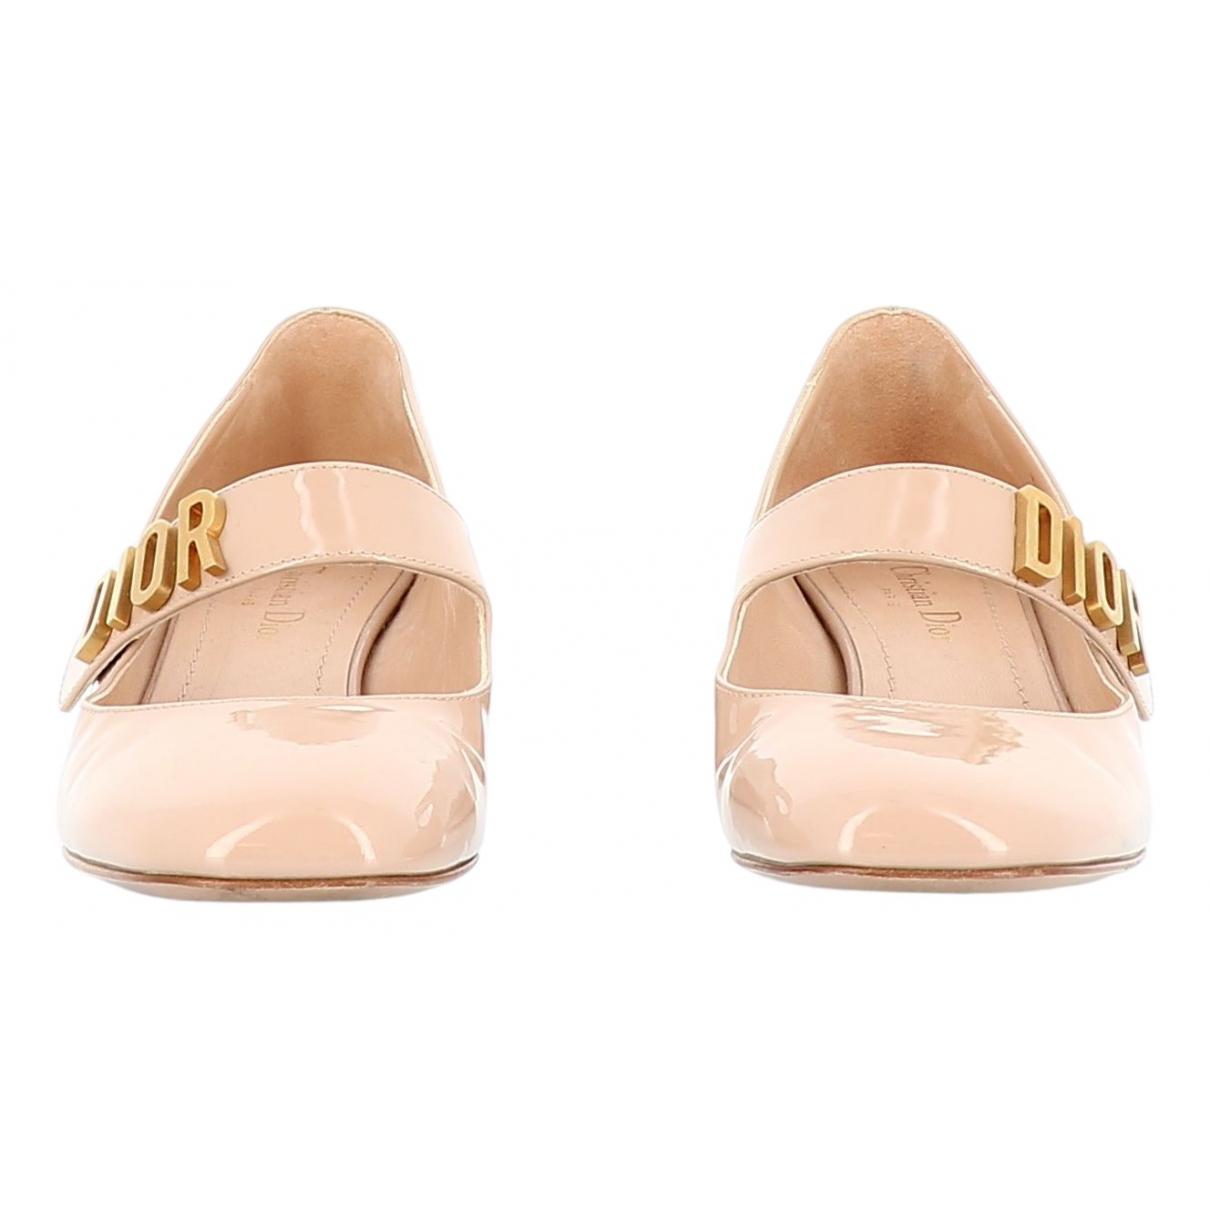 Dior \N Beige Patent leather Heels for Women 38.5 EU